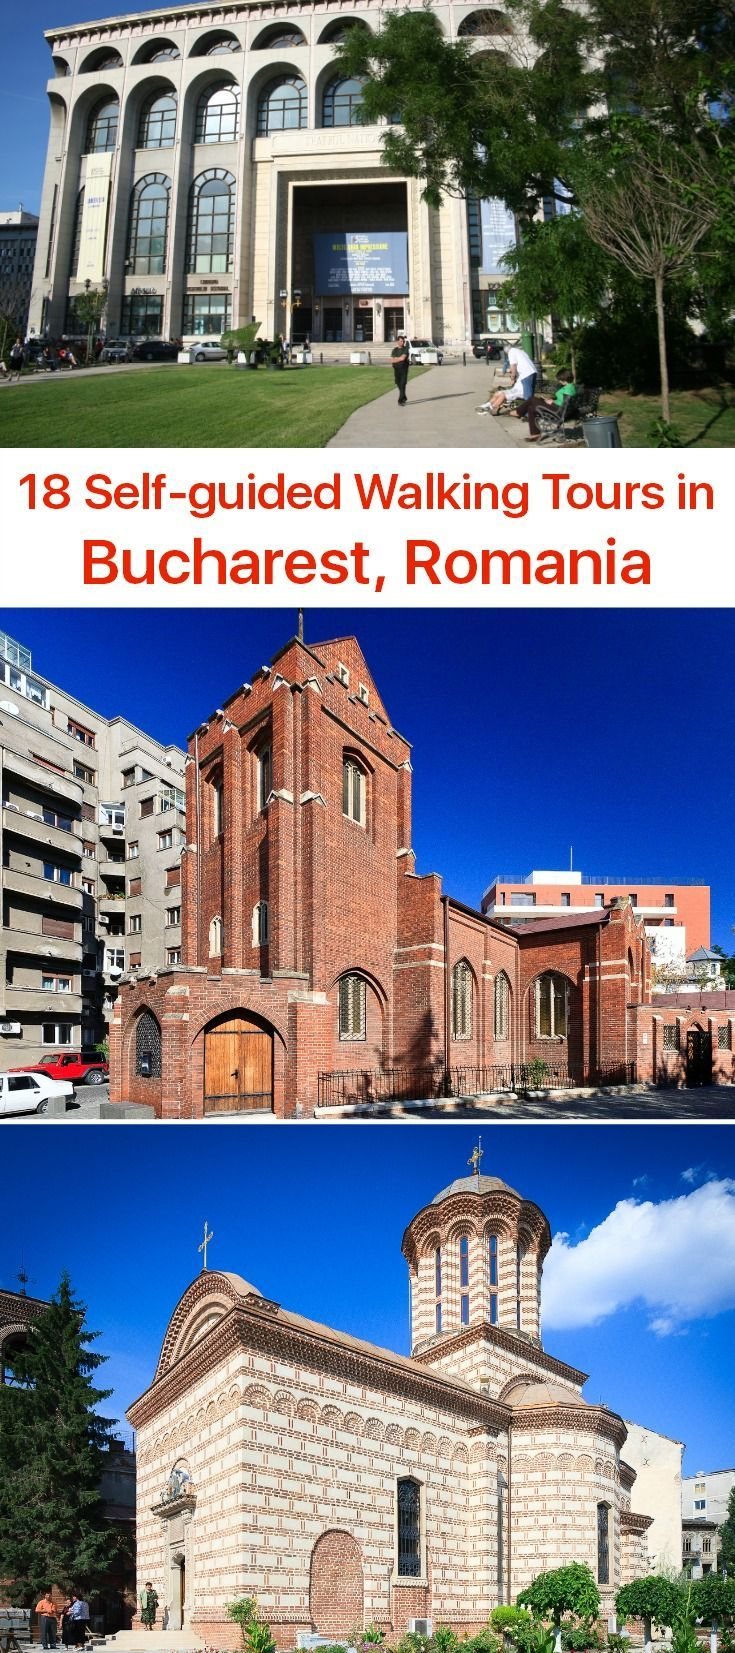 Best 25 romania eu ideas on pinterest romania in eu - Romanian architectural styles ...